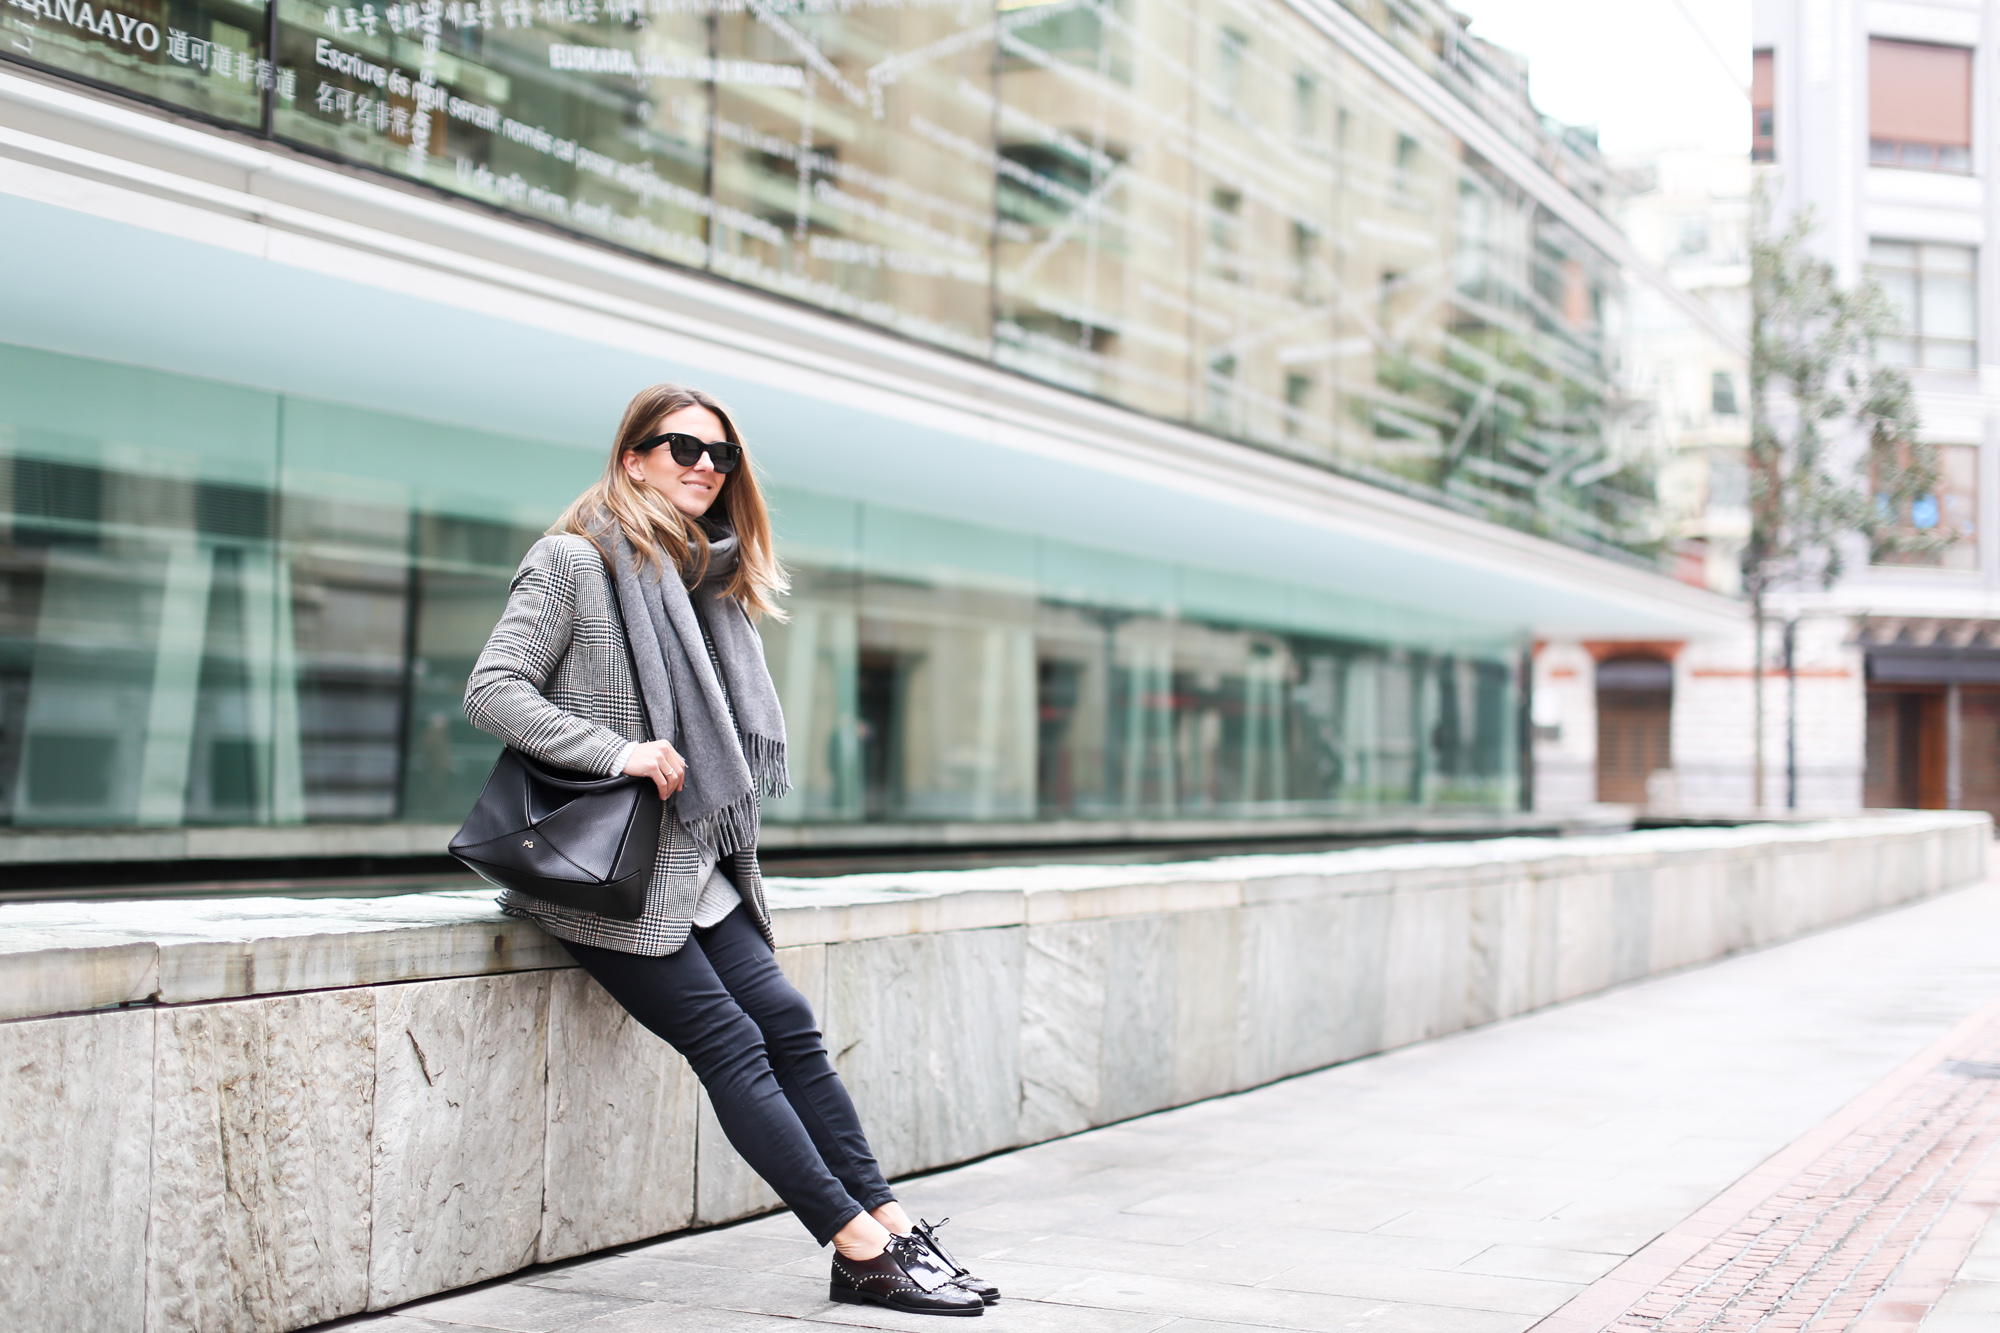 Clochet_streetstyle_fashionblogger_zapatosoxfordtachuelasPertini_bolsotangrampurificaciongarcia-3